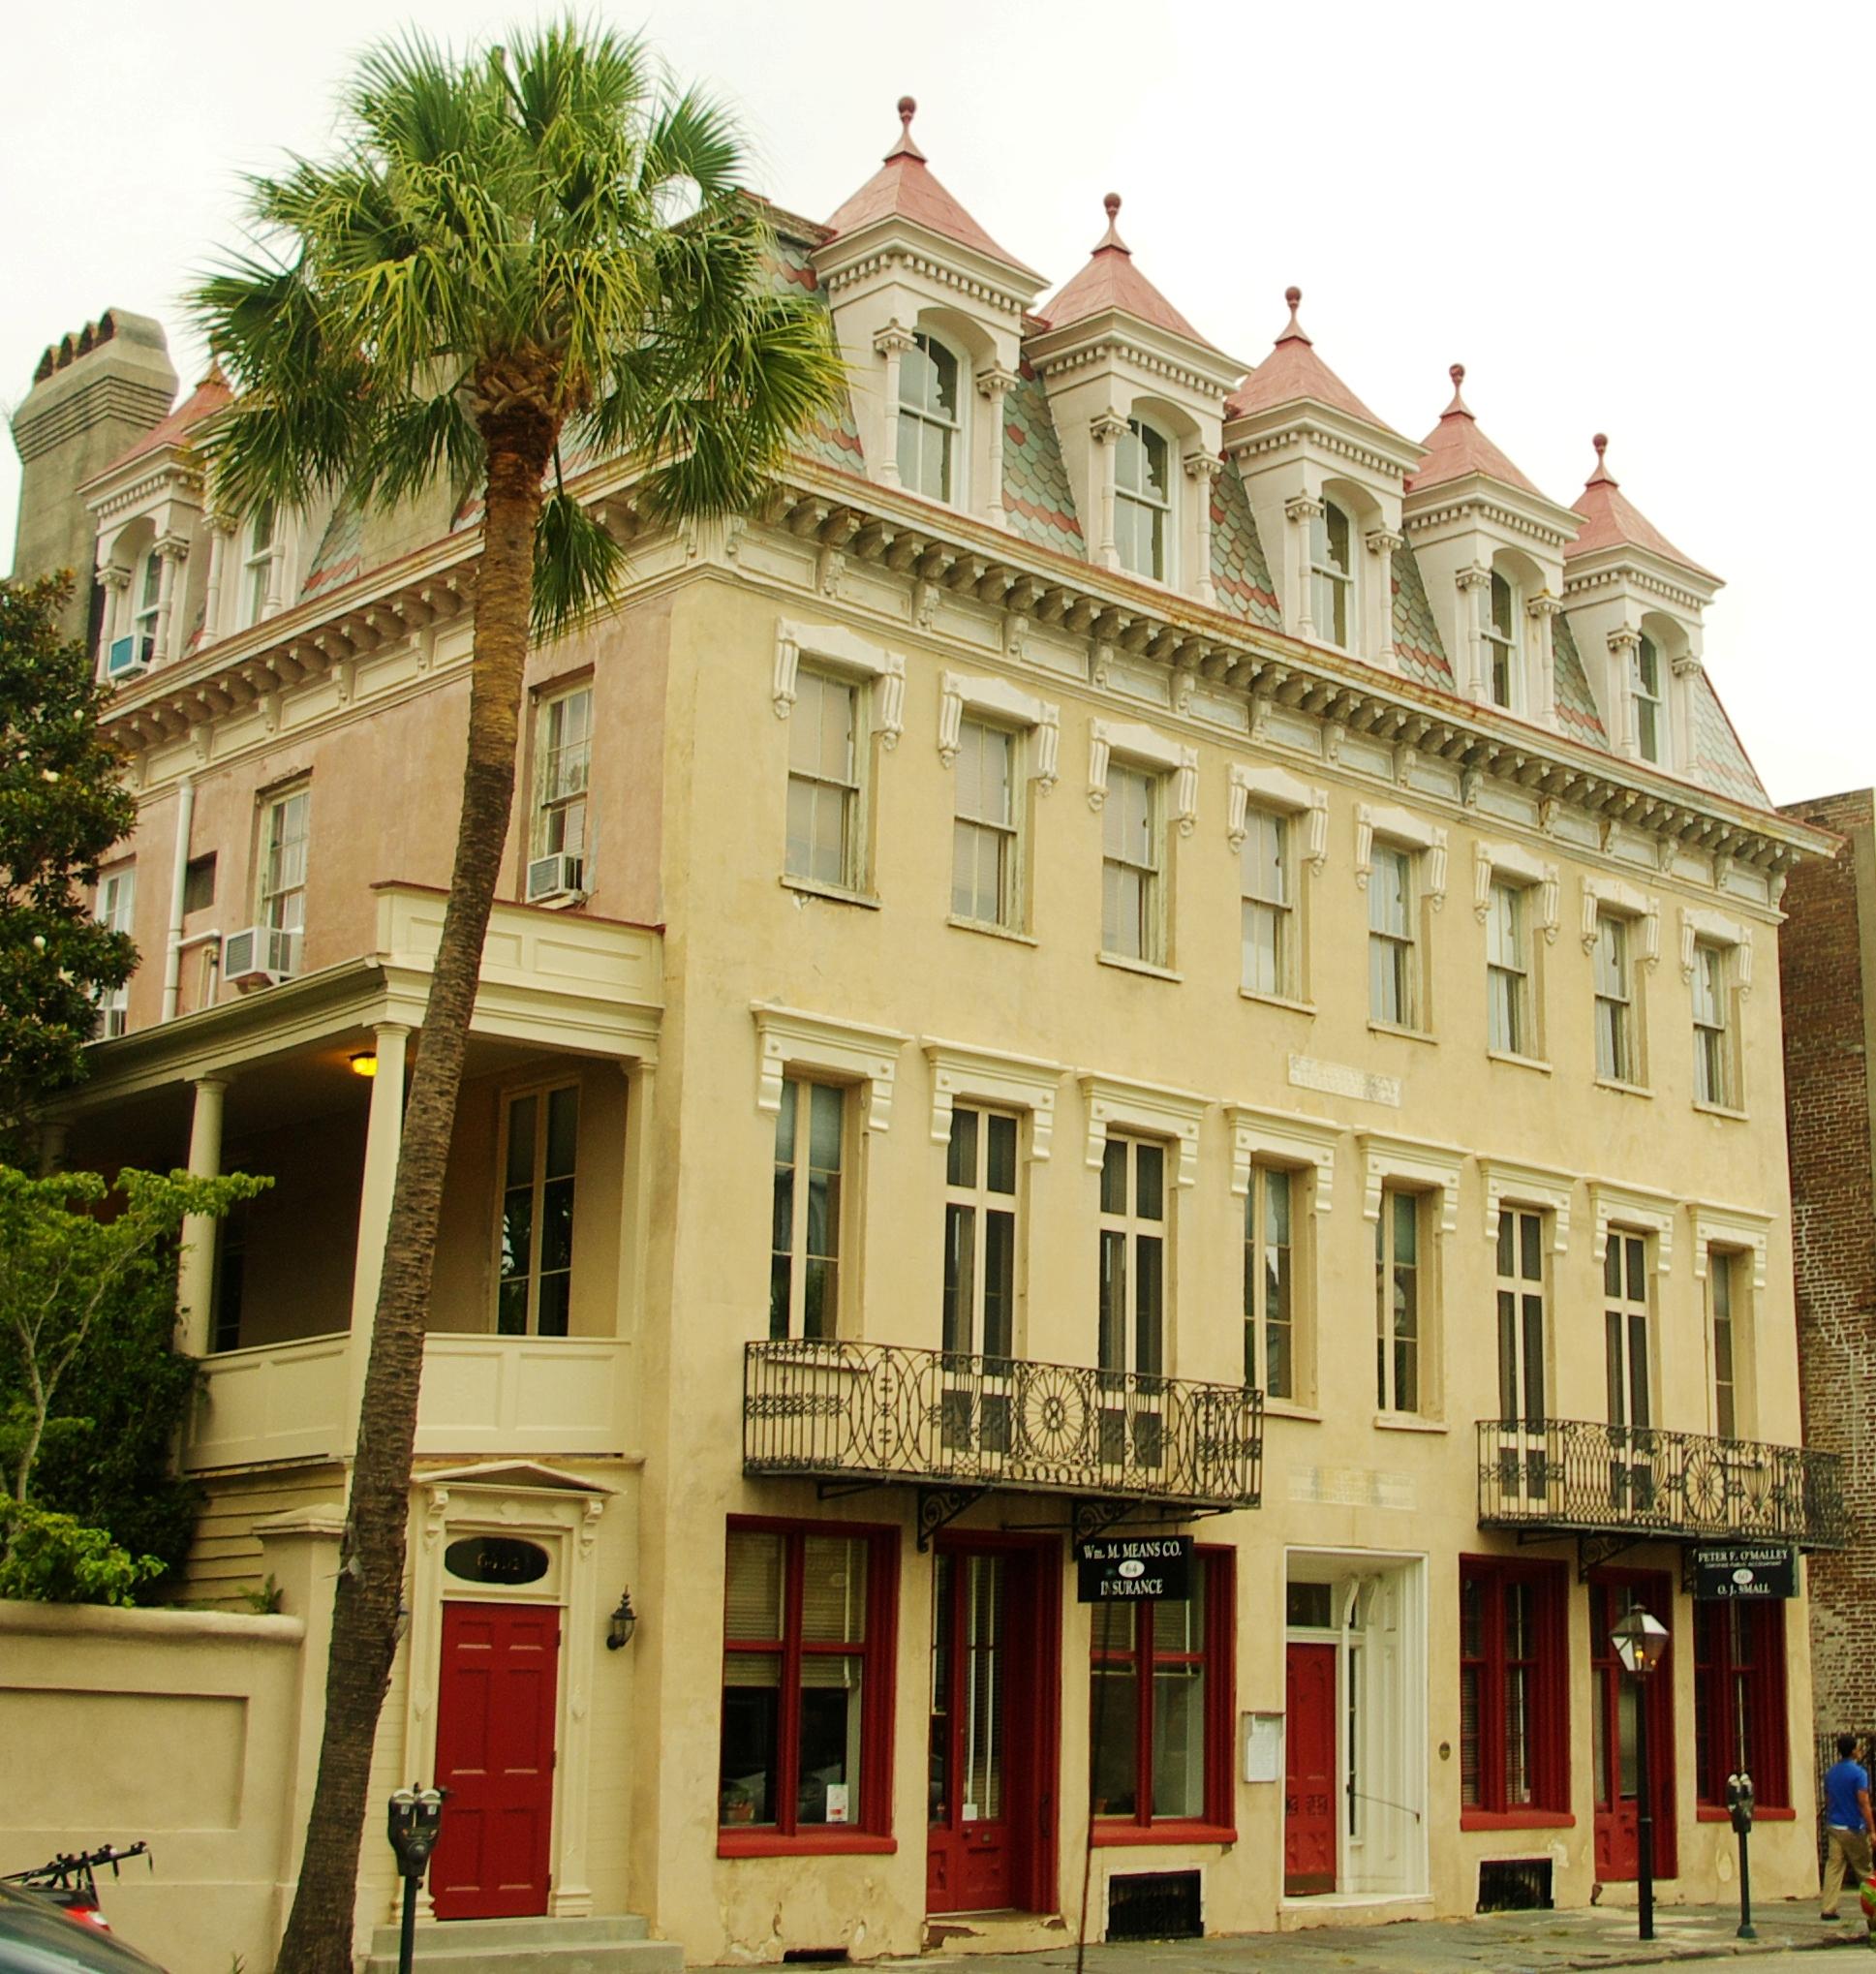 Charleston Sc Homes: File:Confederate-home-charleston-sc1.jpg